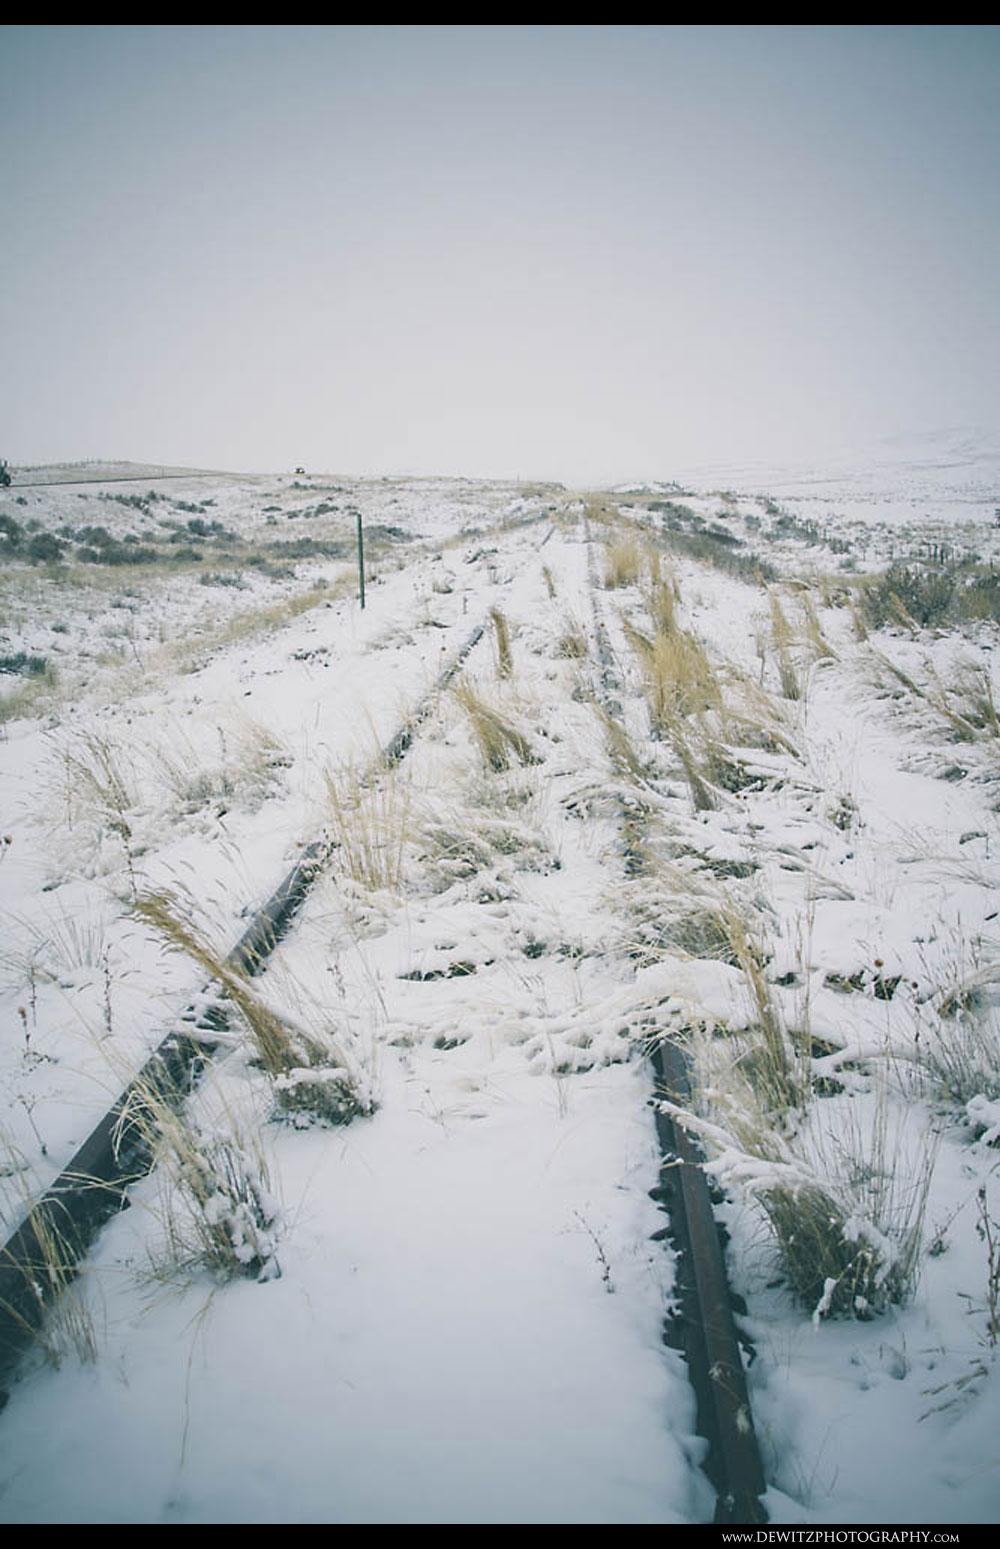 242Abandoned Snow Covered Train Tracks Along the Powder River Basin